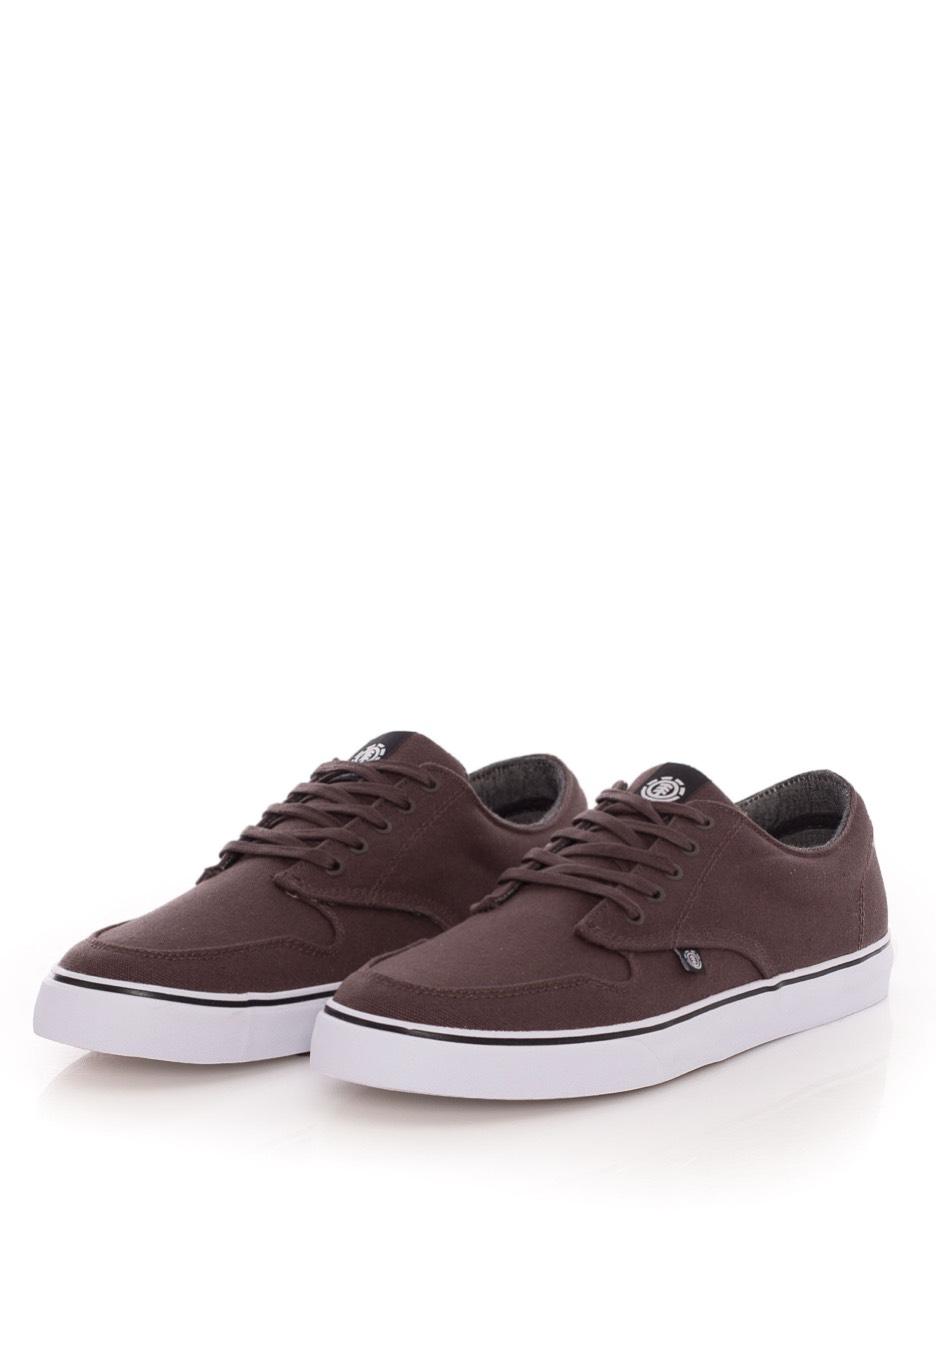 Topaz C3 Zapatos Es Element Chocolate YB4nYR